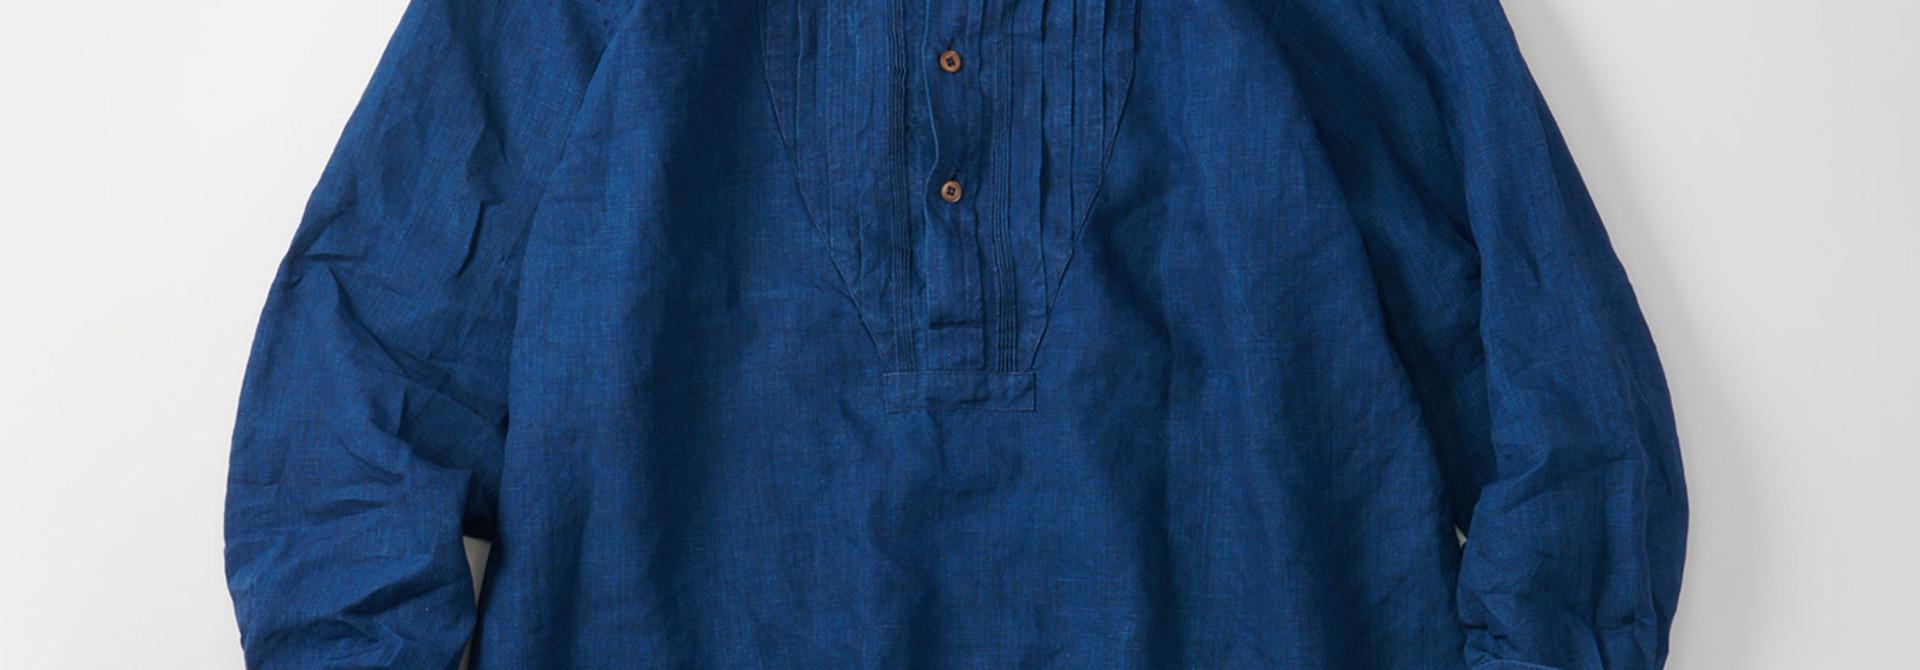 WH Indigo Linen Pin-tuck 908 Shirt